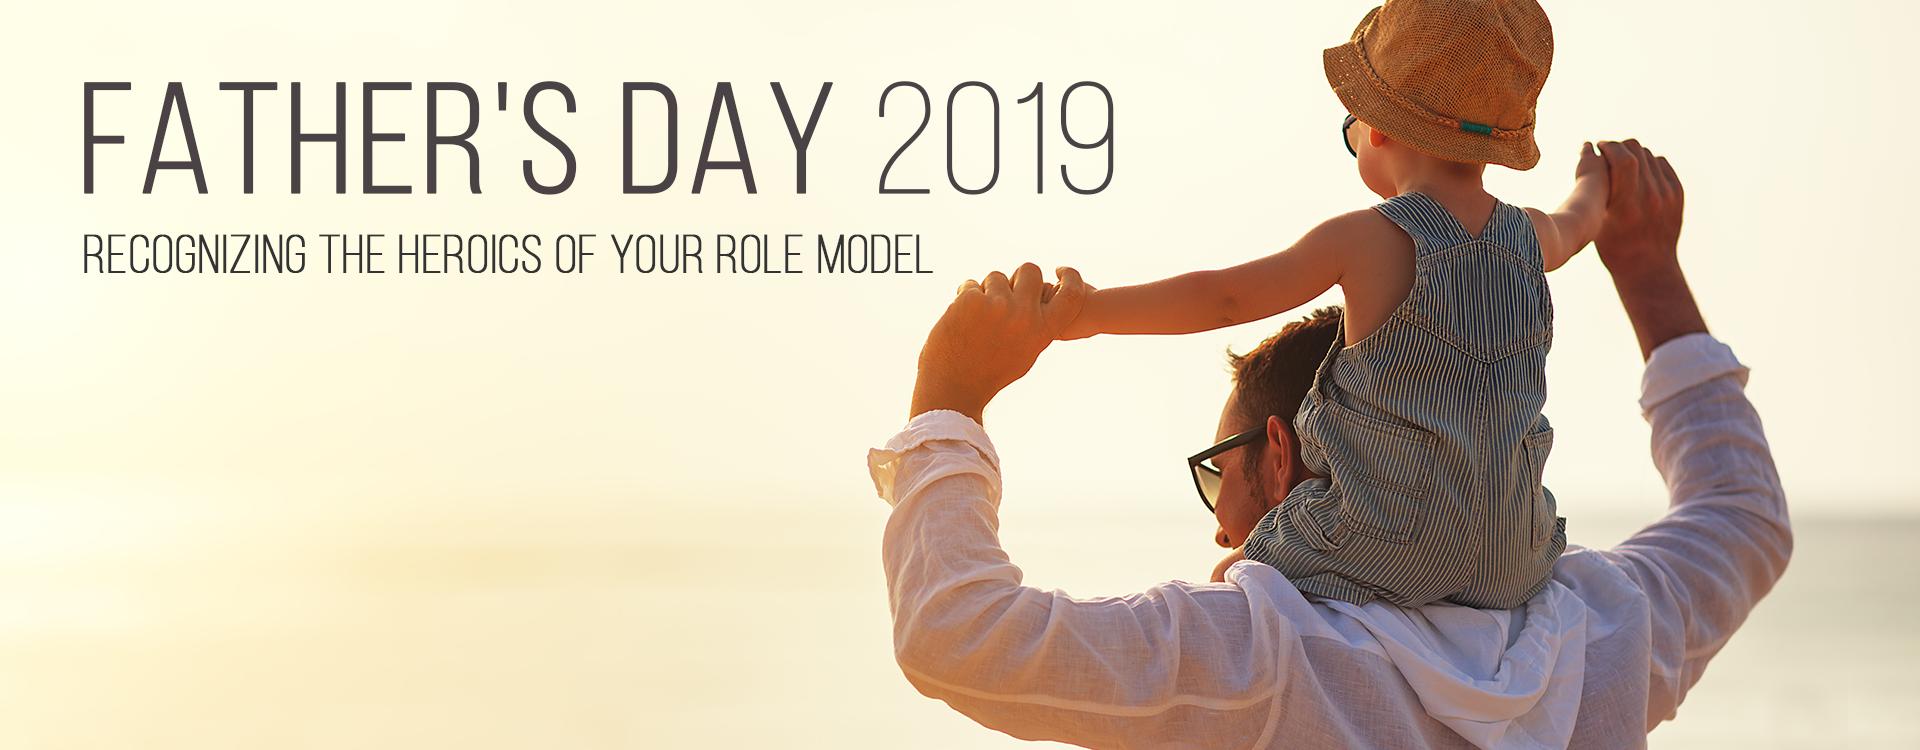 Father's Day 2019 - Flamboyance of The Fatherhood: